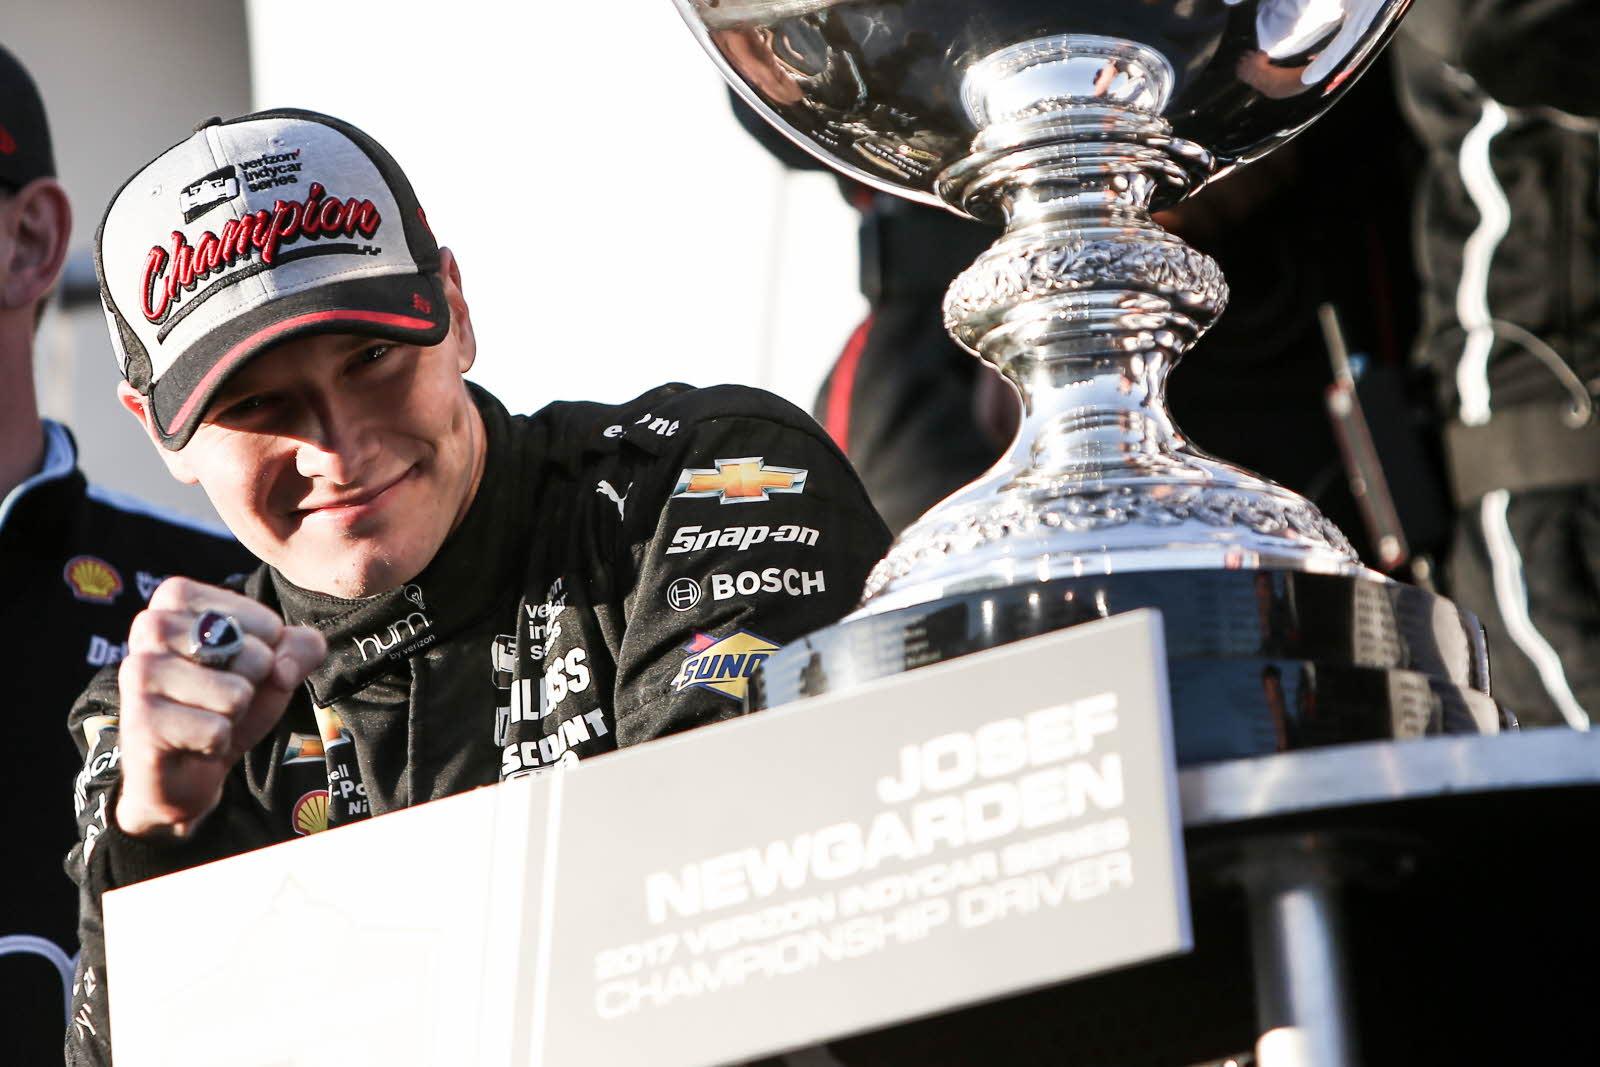 Josef Newgarden won the Indycar championship 2017